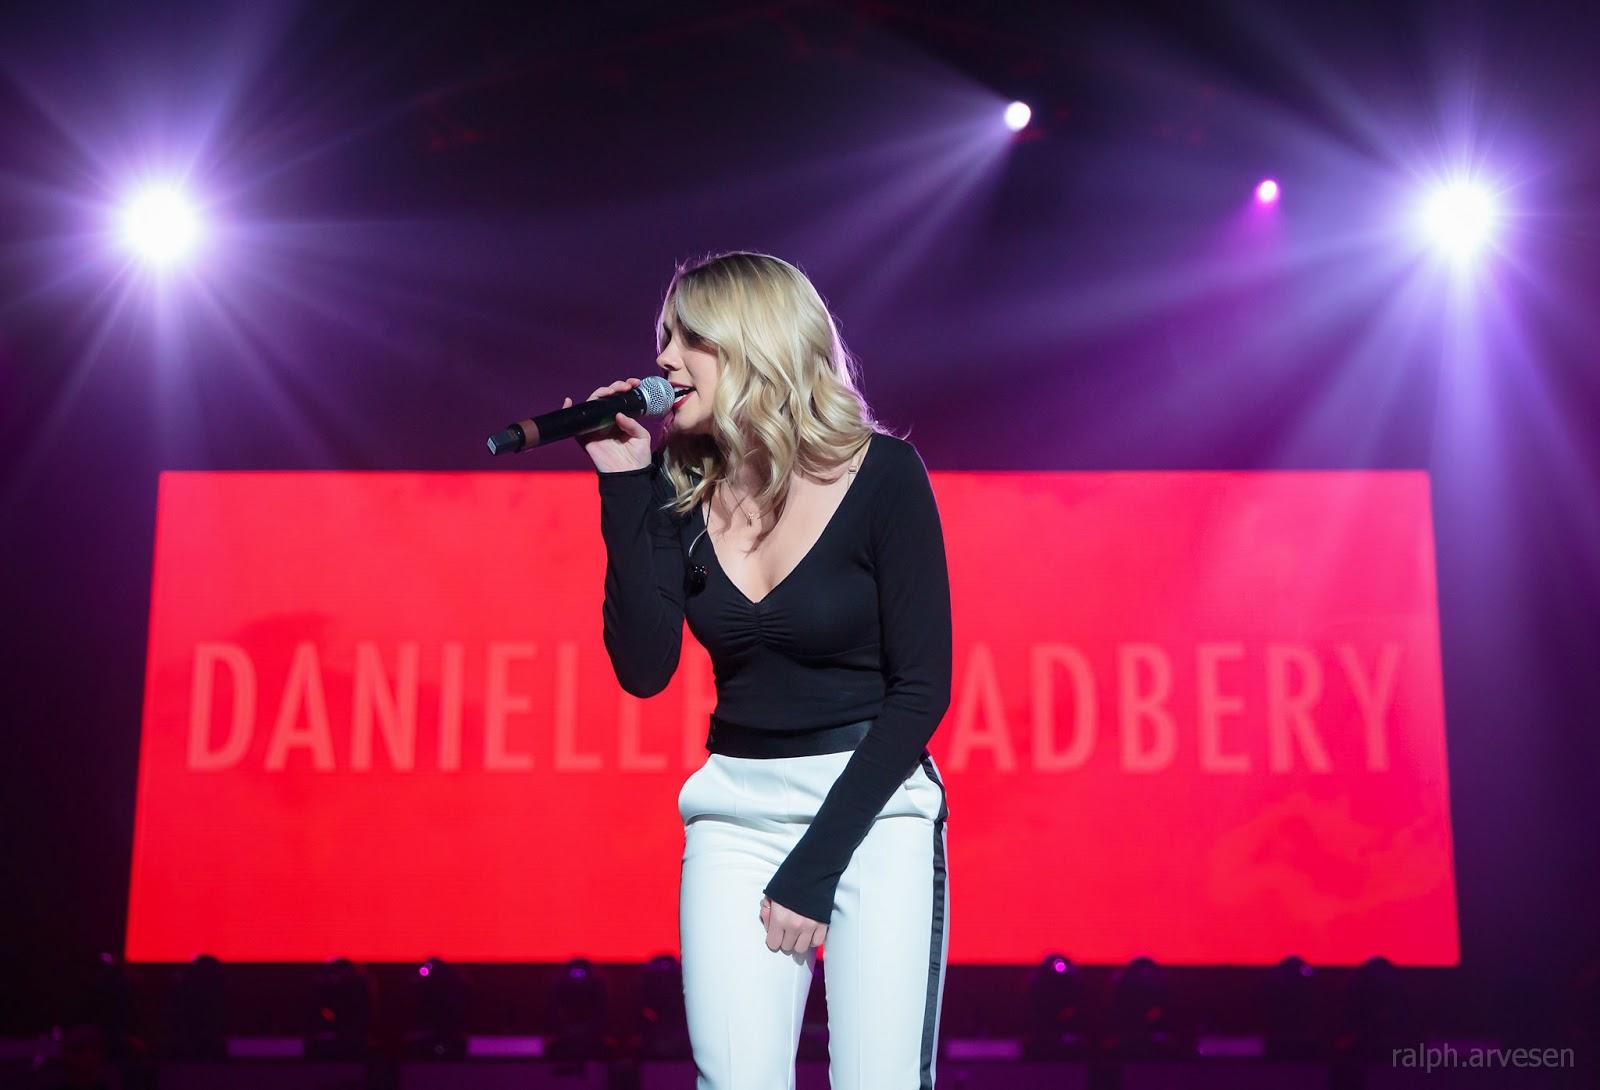 Danielle Bradbery | Texas Review | Ralph Arvesen